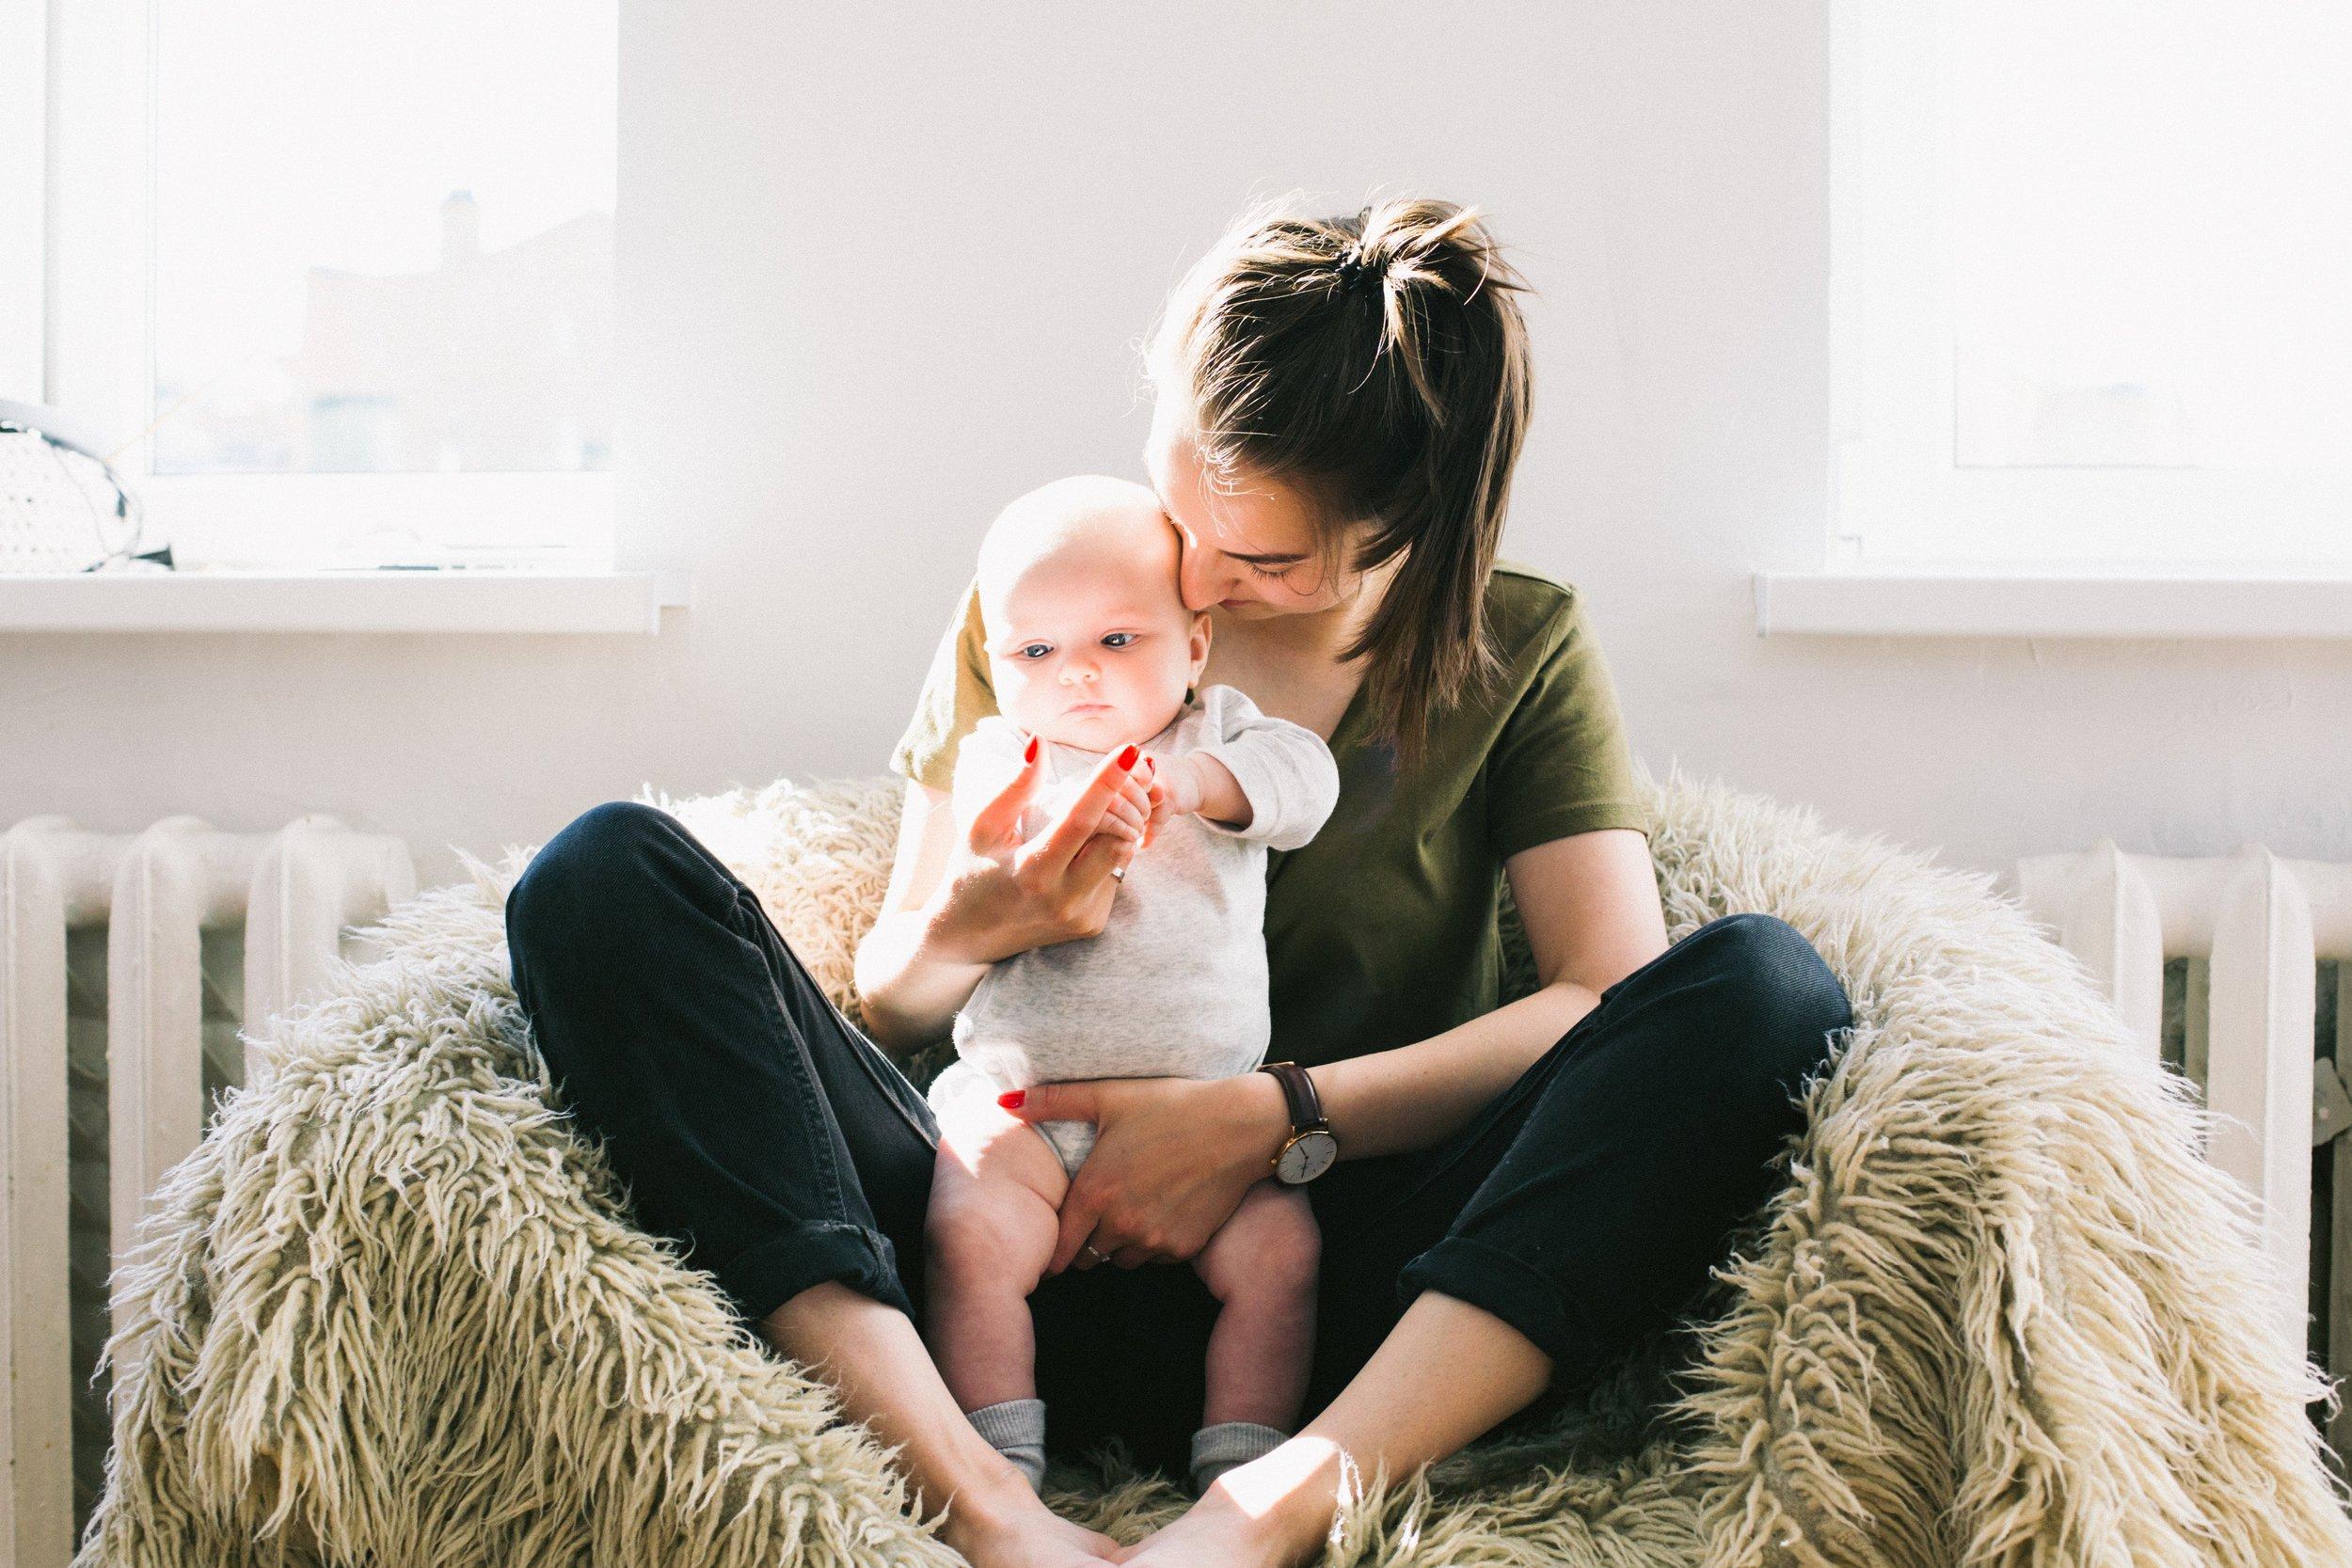 Nanny_and_baby